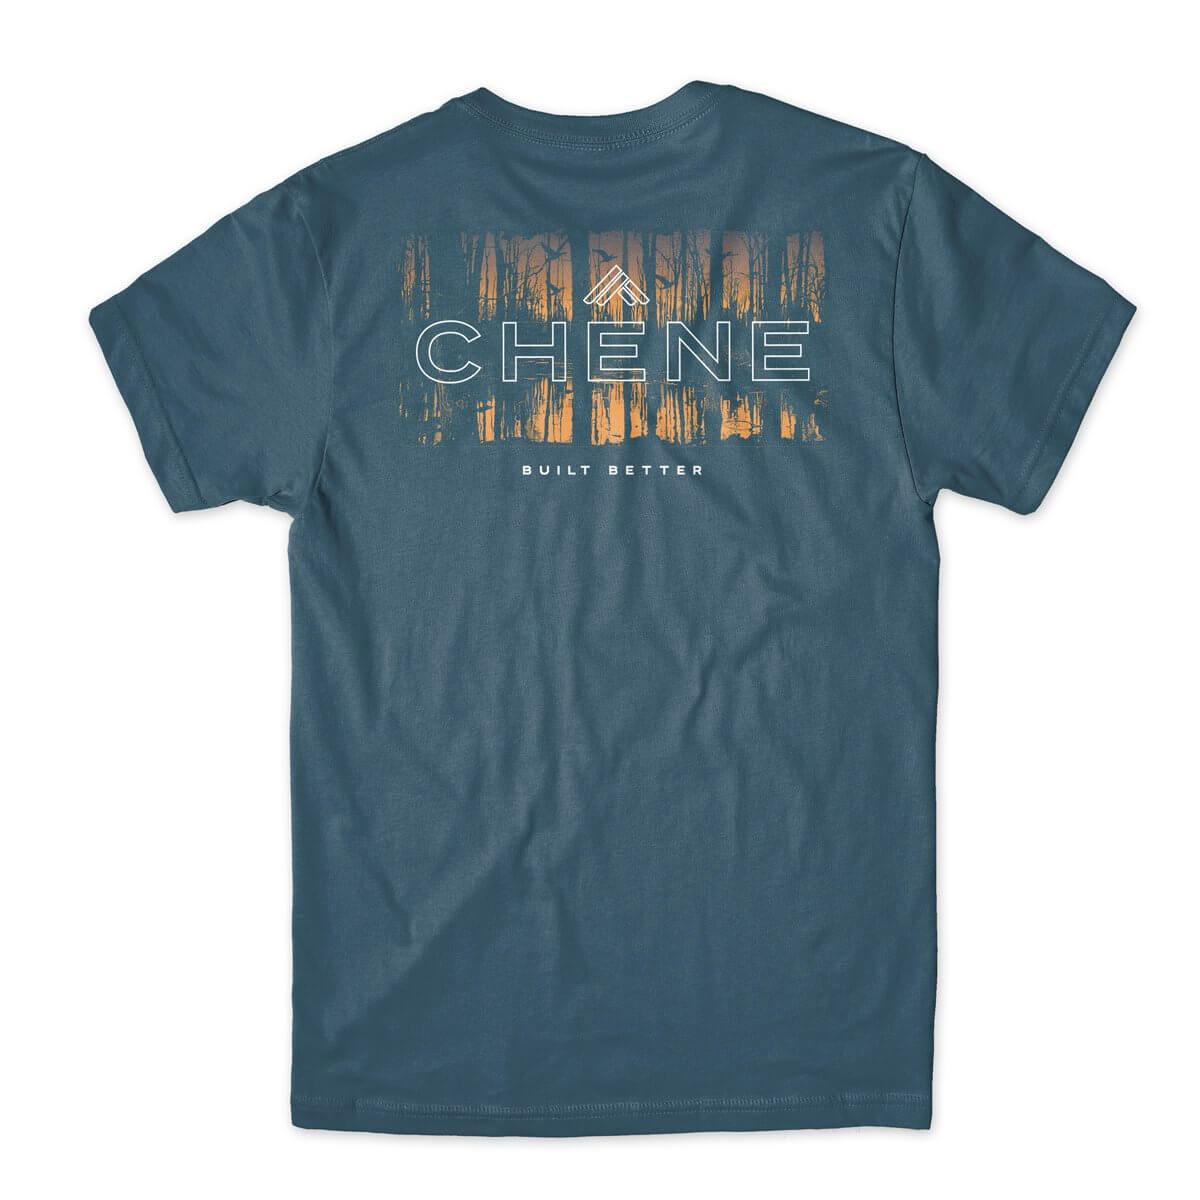 Chene Flooded Timber t-shirt